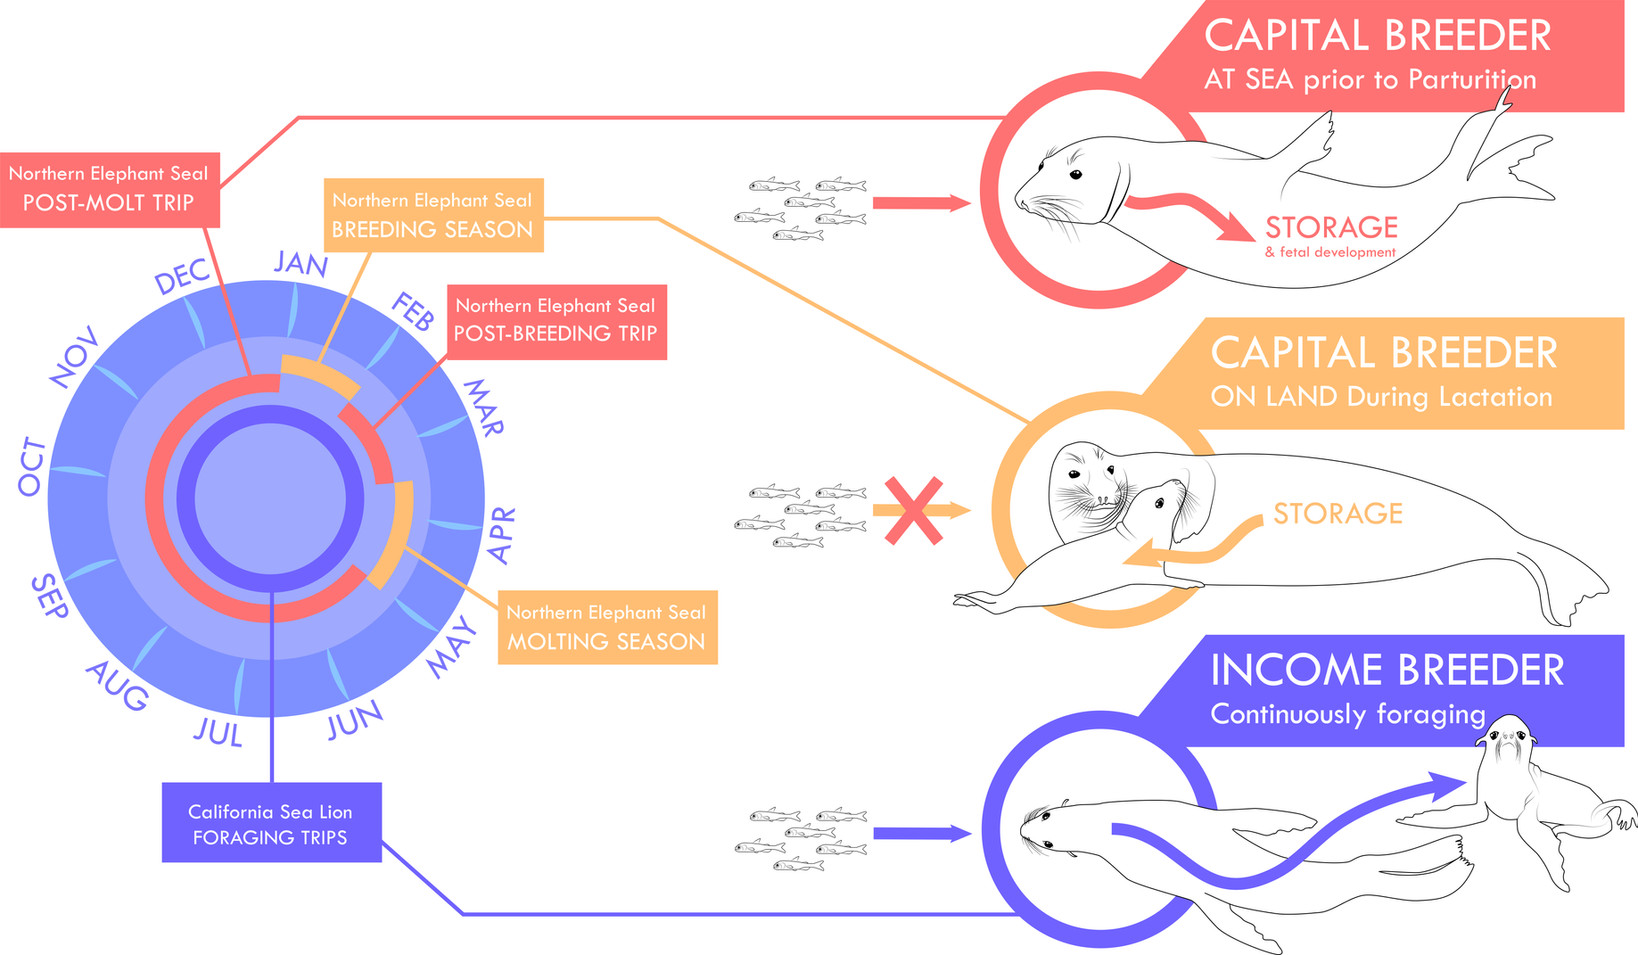 Capital versus Income Breeding